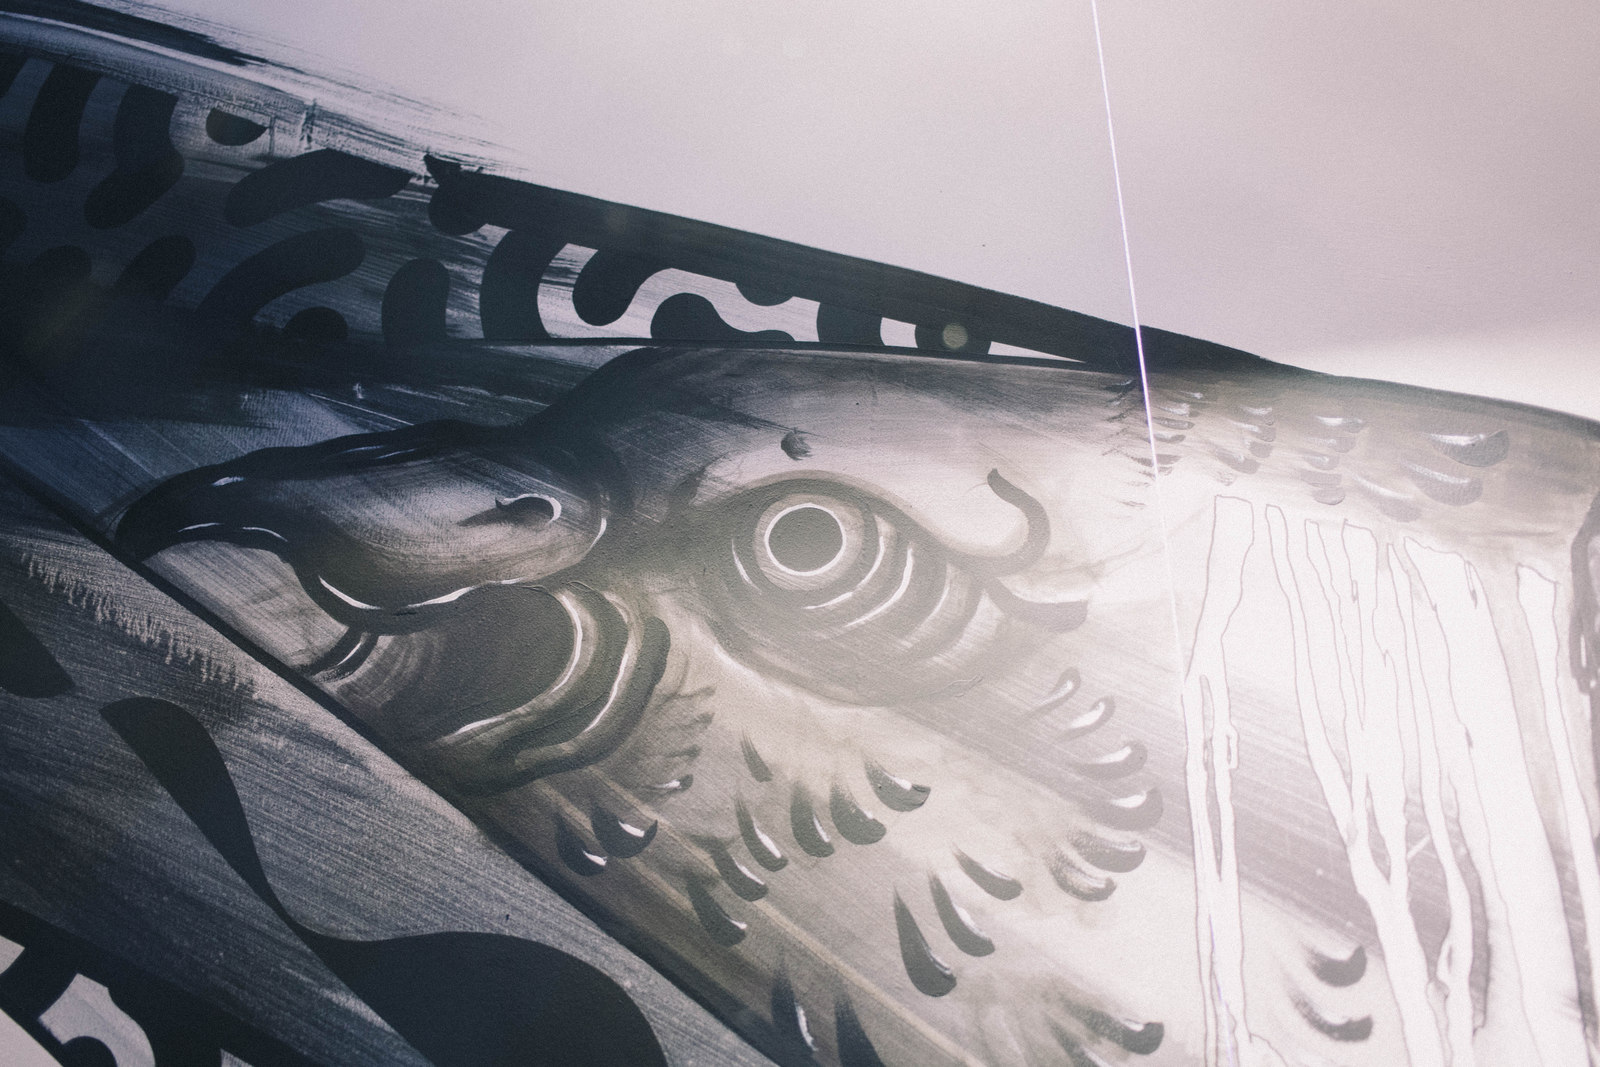 IMG_1971 国内外で活躍するアーティスト4組の「作品の向こう側」| ジャーナル スタンダード「オムニバス展」密着レポート!